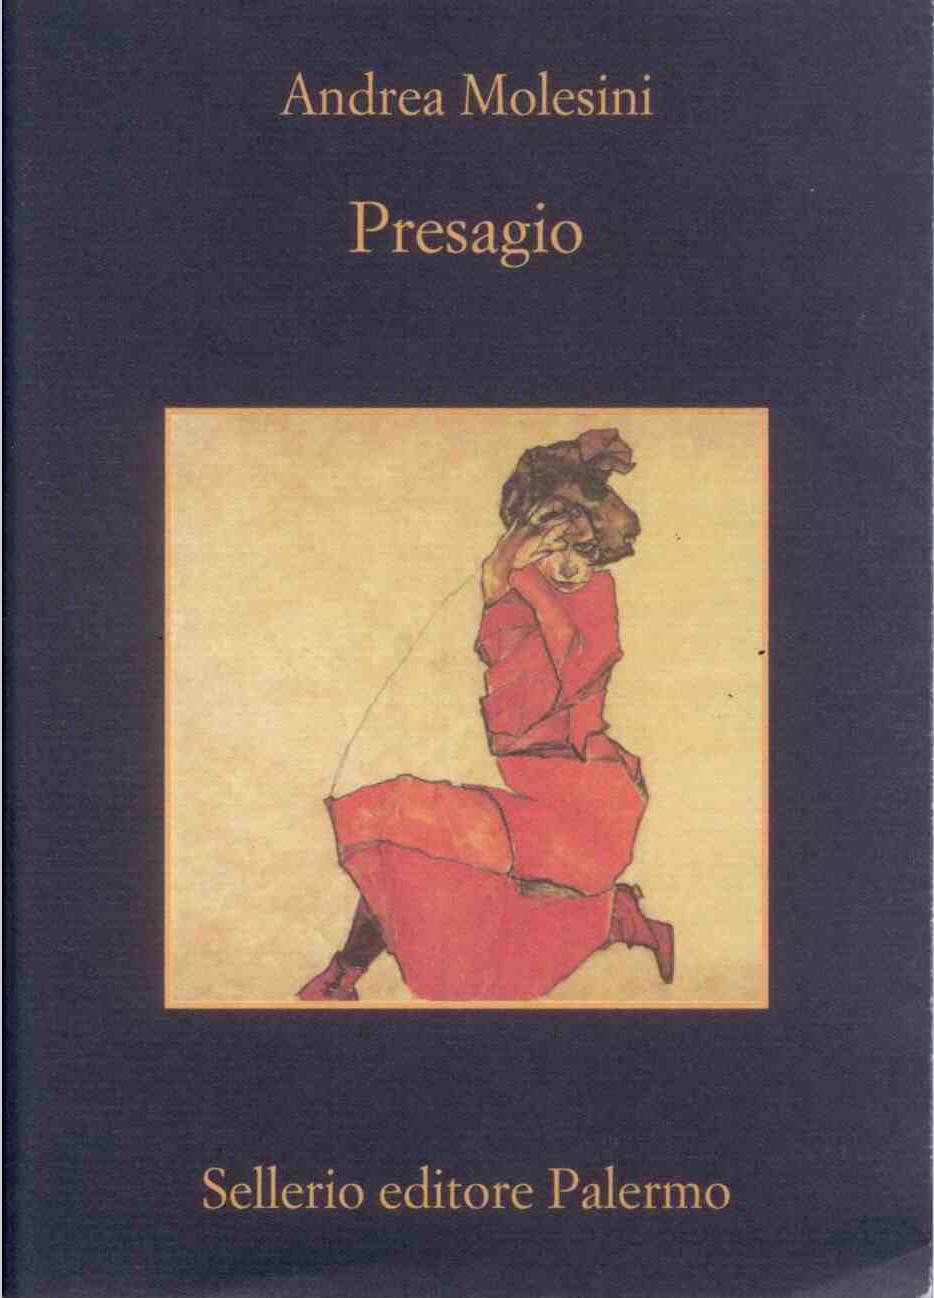 Copertina Presagio.jpg